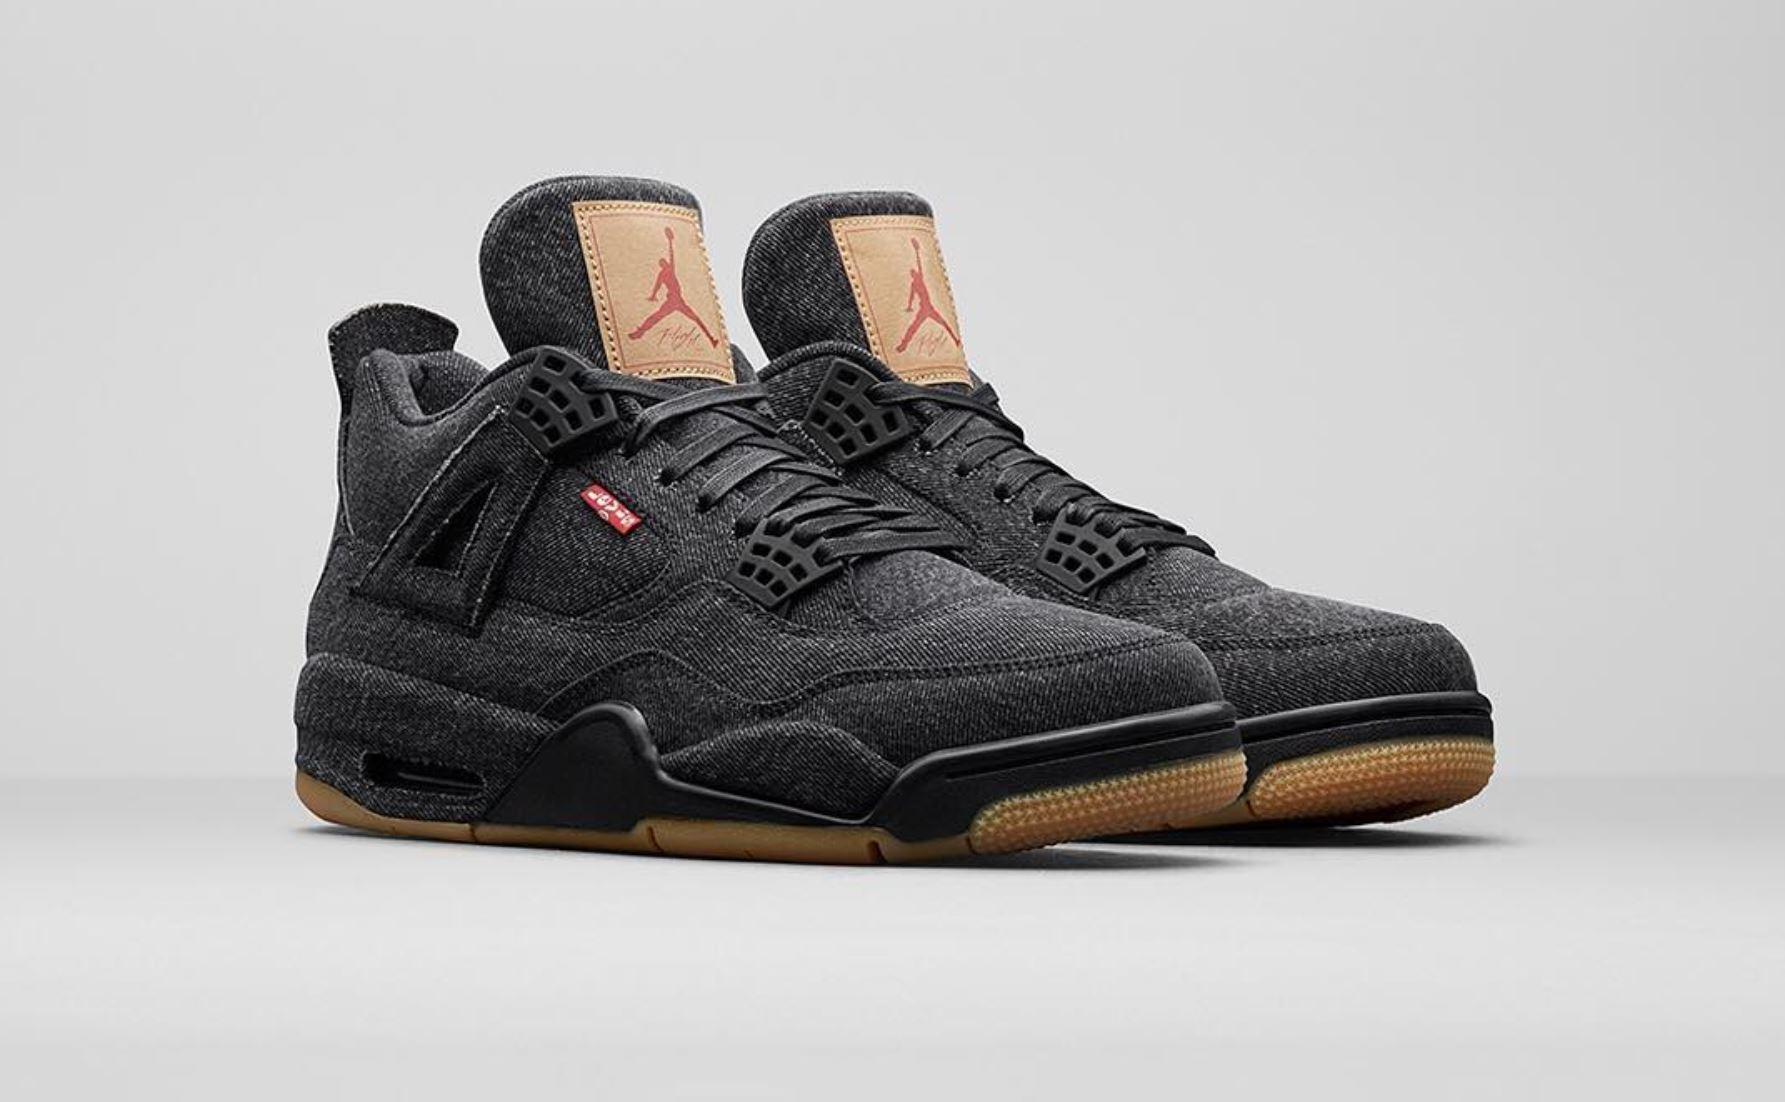 The Next Two Levi's x Air Jordan 4